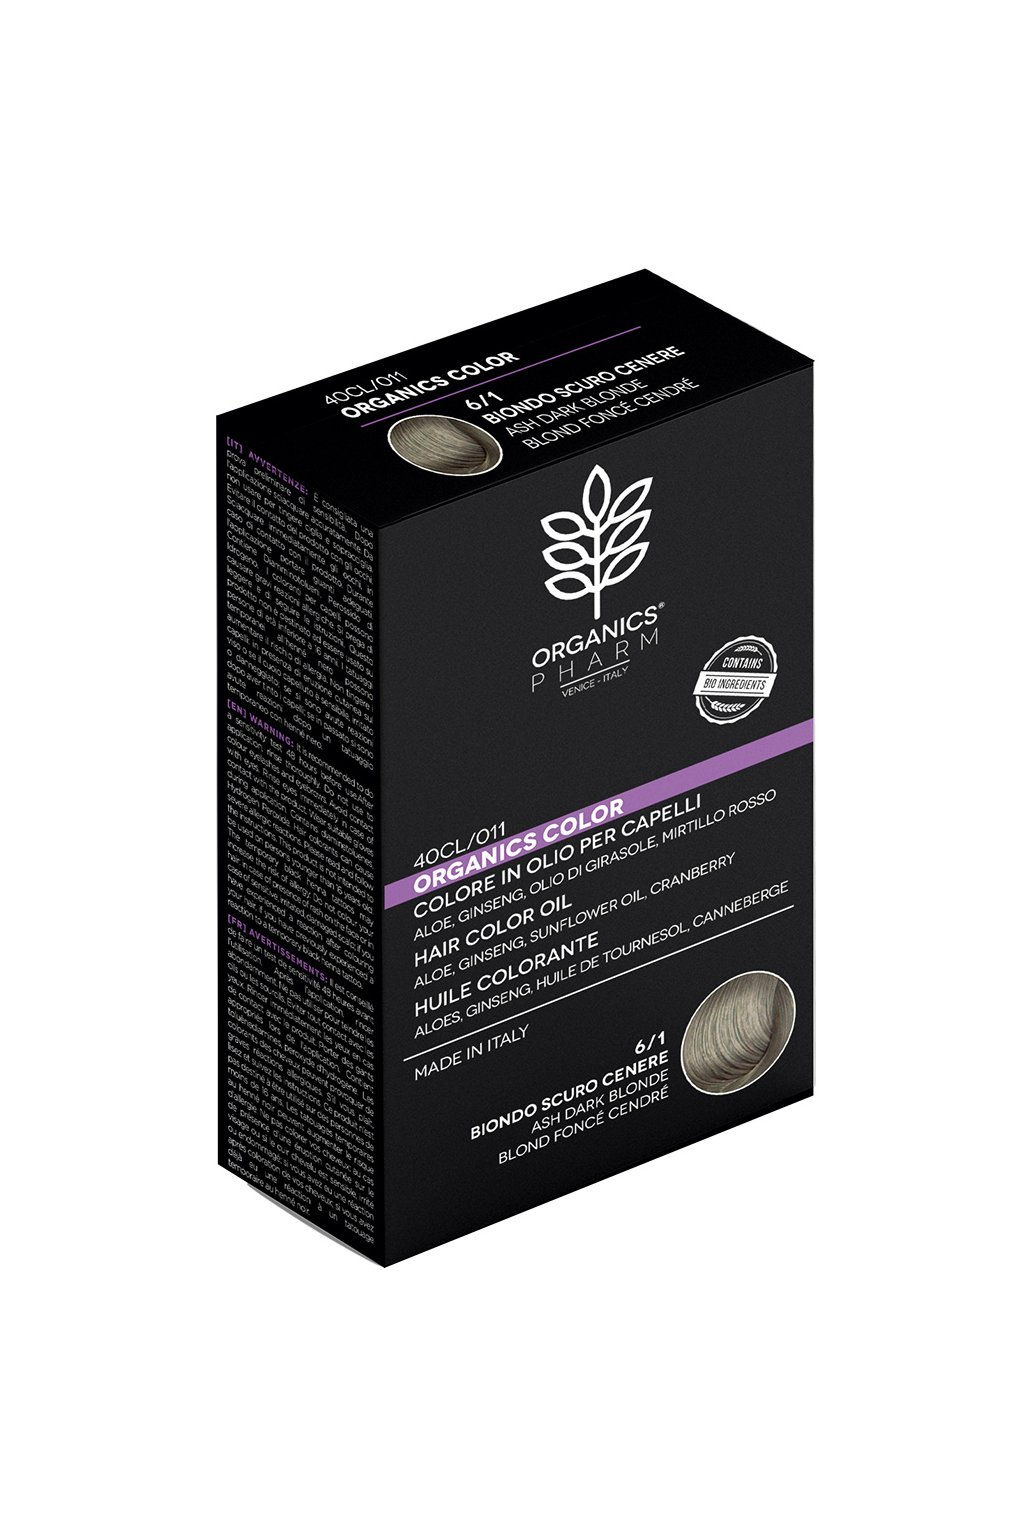 ORGANICS PHARM Organics Color Hair Color Oil 122ml 6 1 Ash Dark Brown